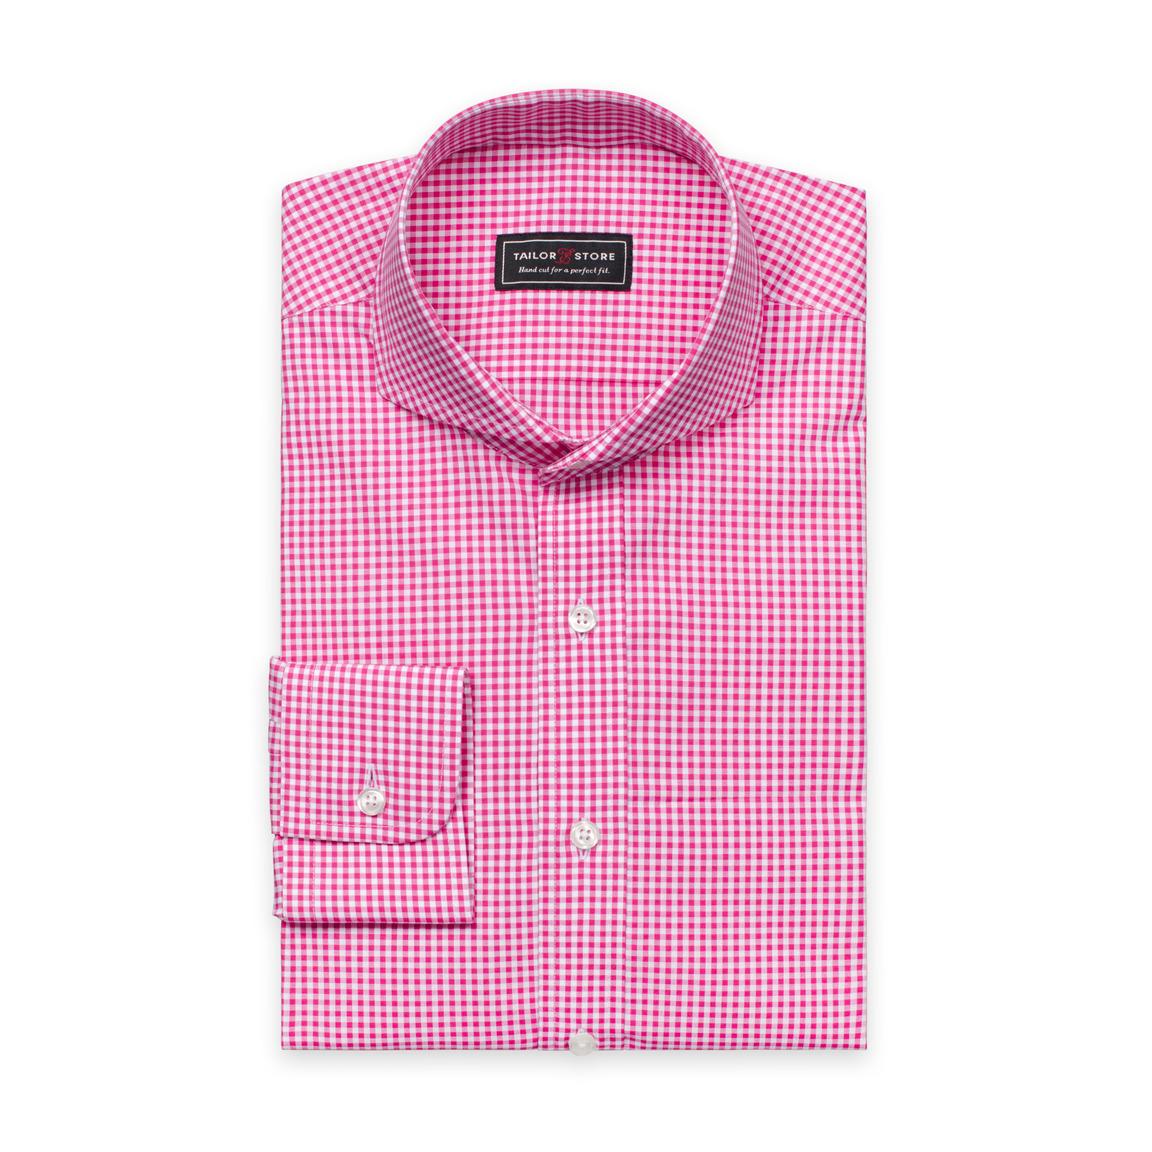 Pink/White checked poplin shirt